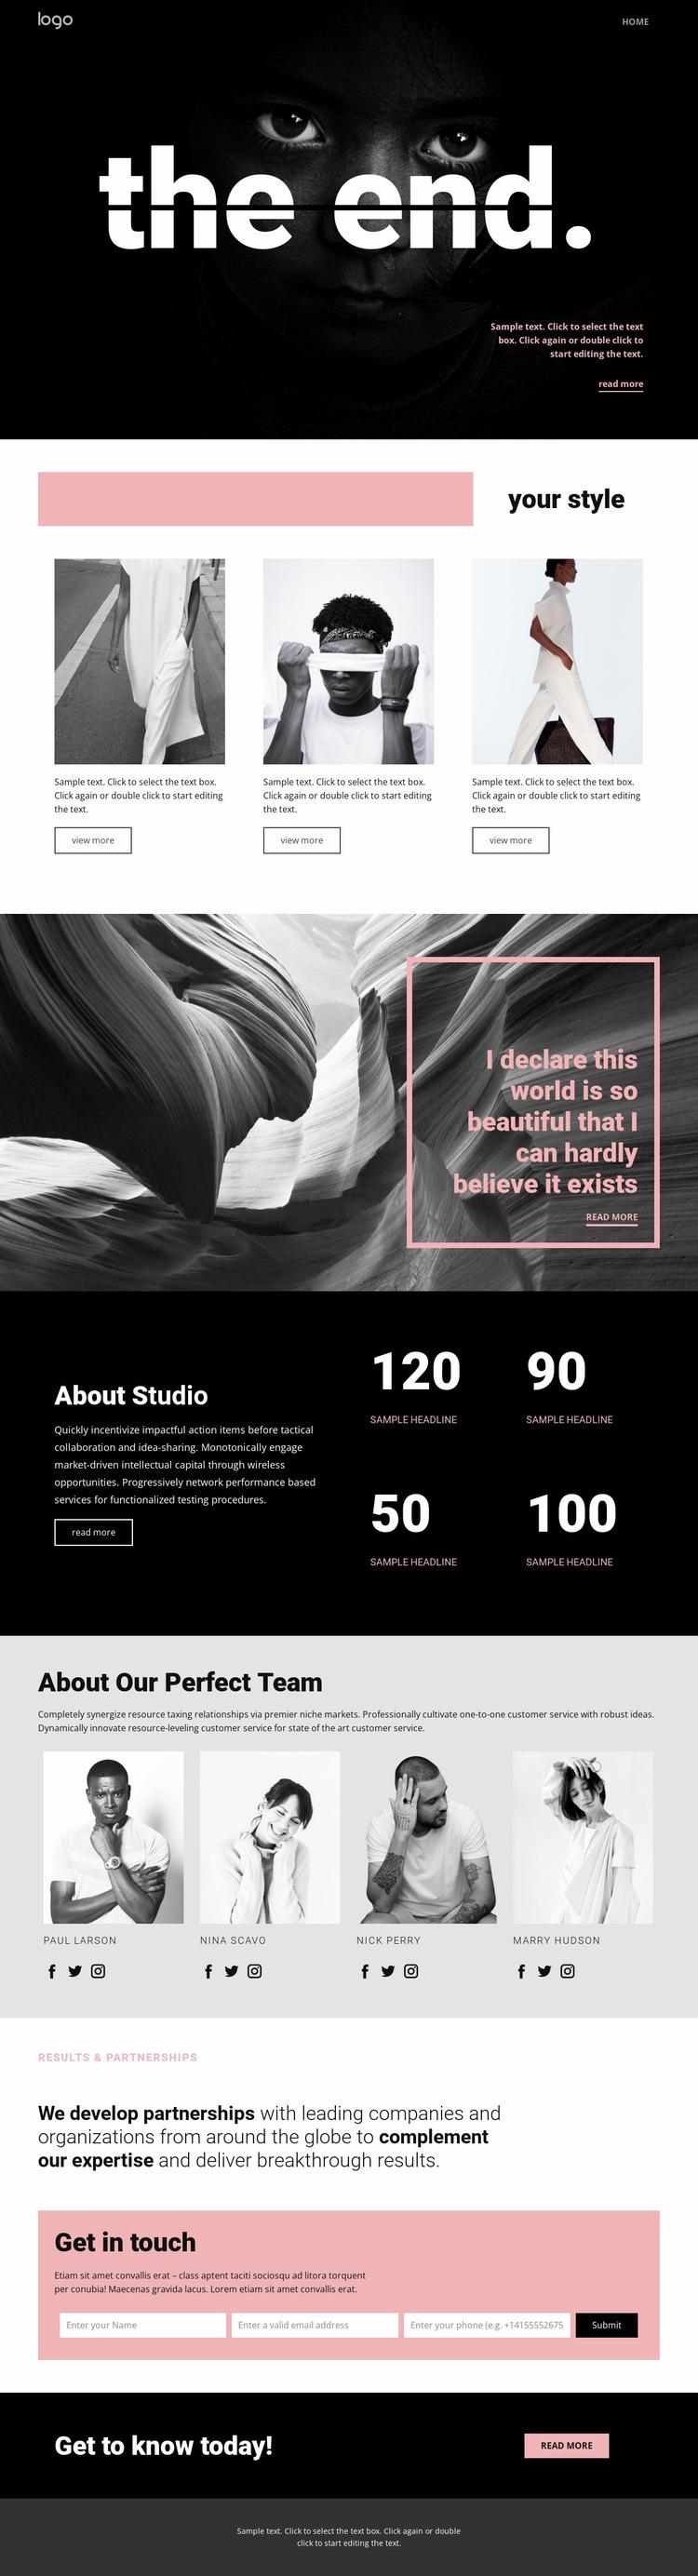 Perfecting styles of art Website Builder